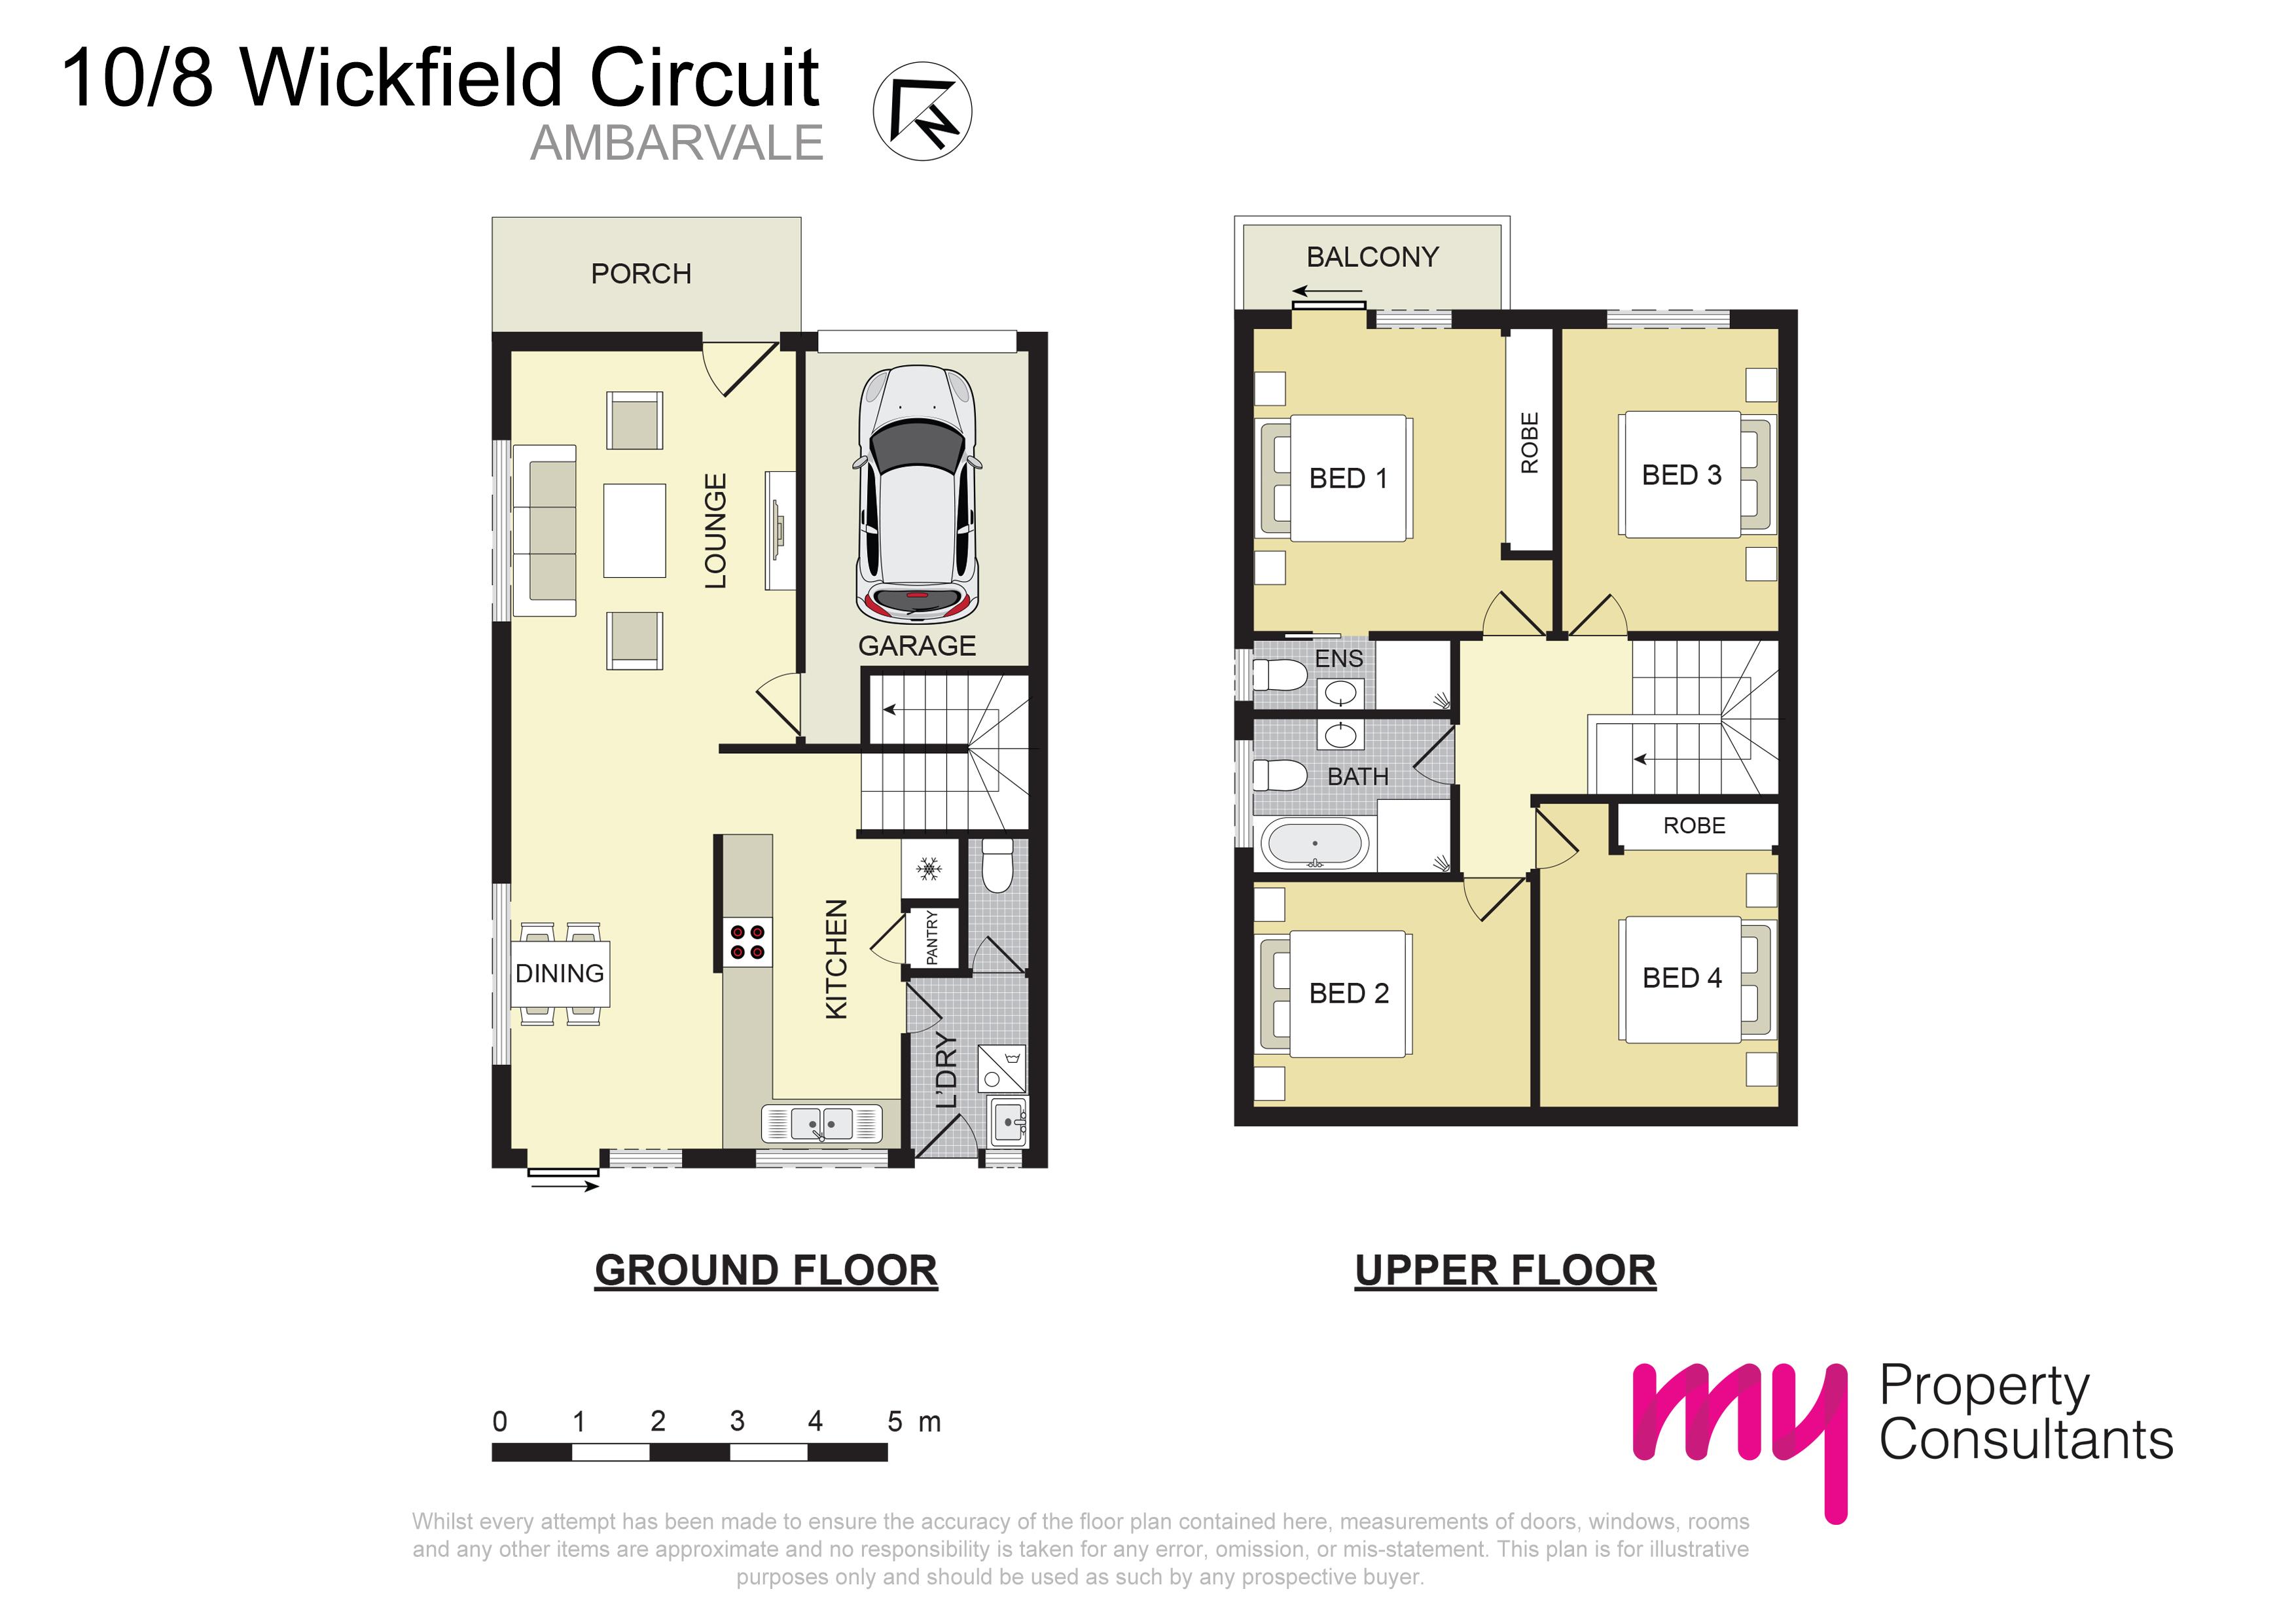 10/8 Wickfield Circuit, AMBARVALE